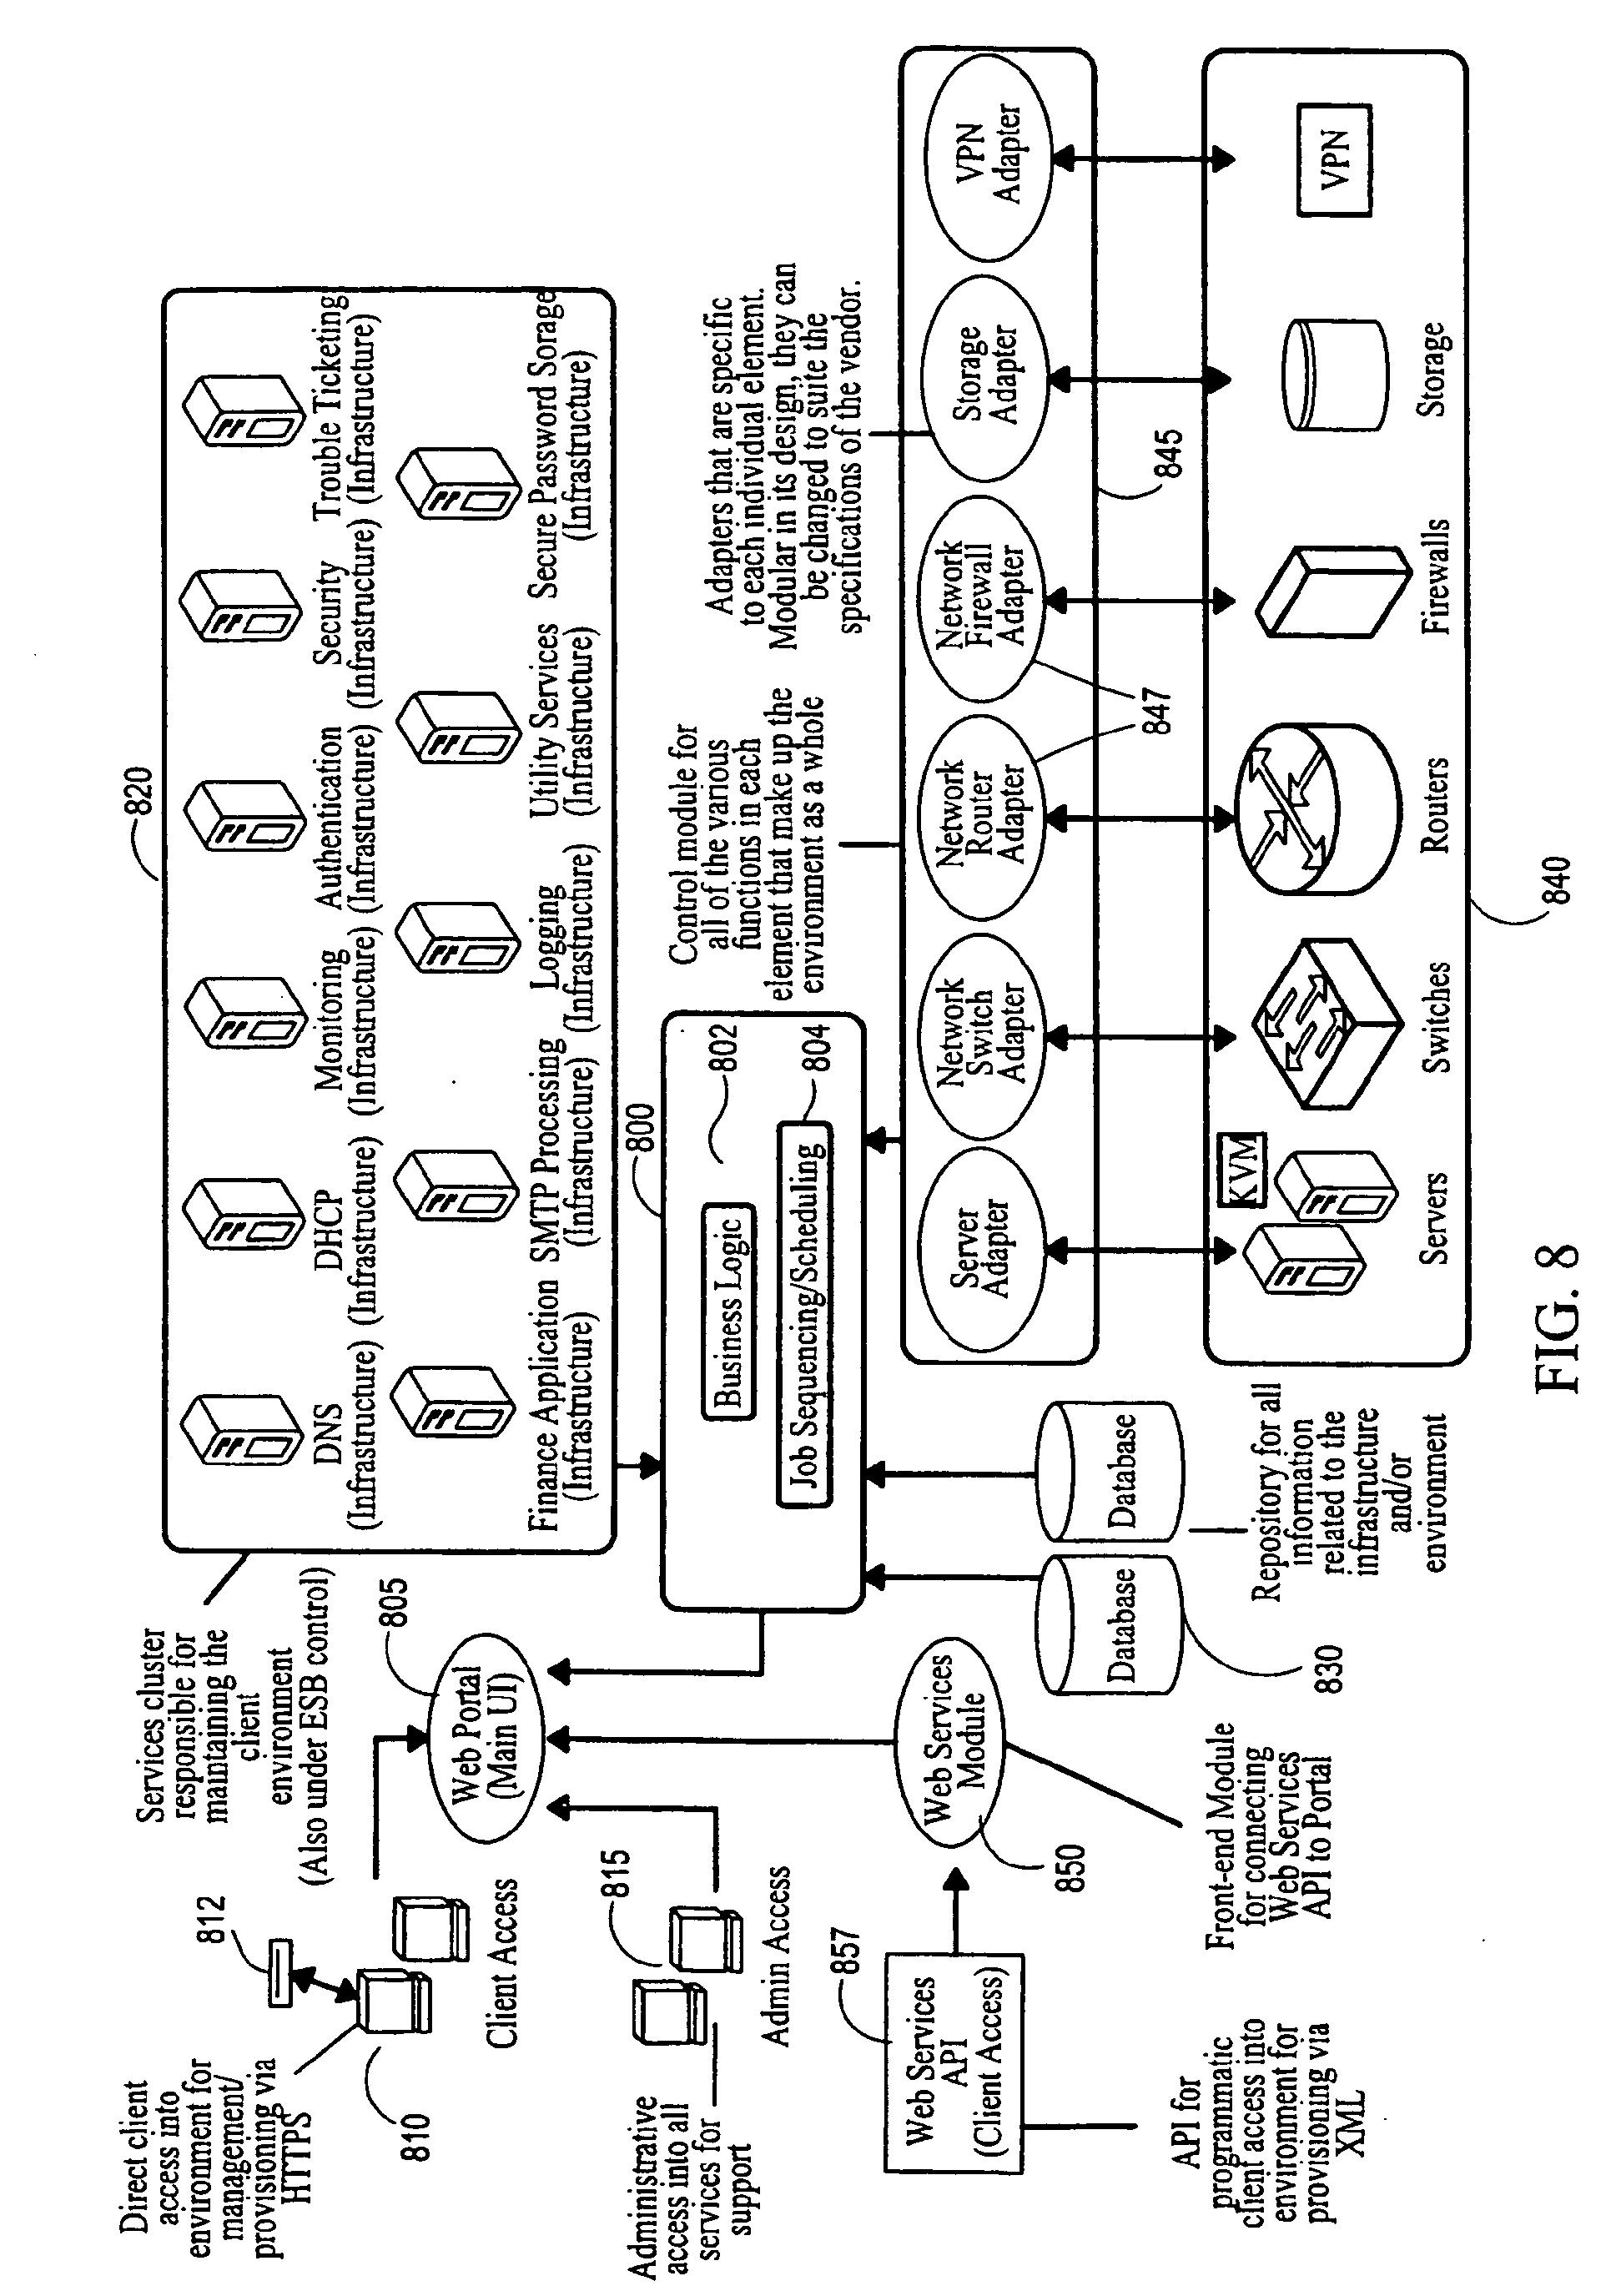 scag tiger cub wiring diagram wiring diagram and schematic design scag stc48v 26bs tiger cub s n d1300001 d1399999 parts diagrams